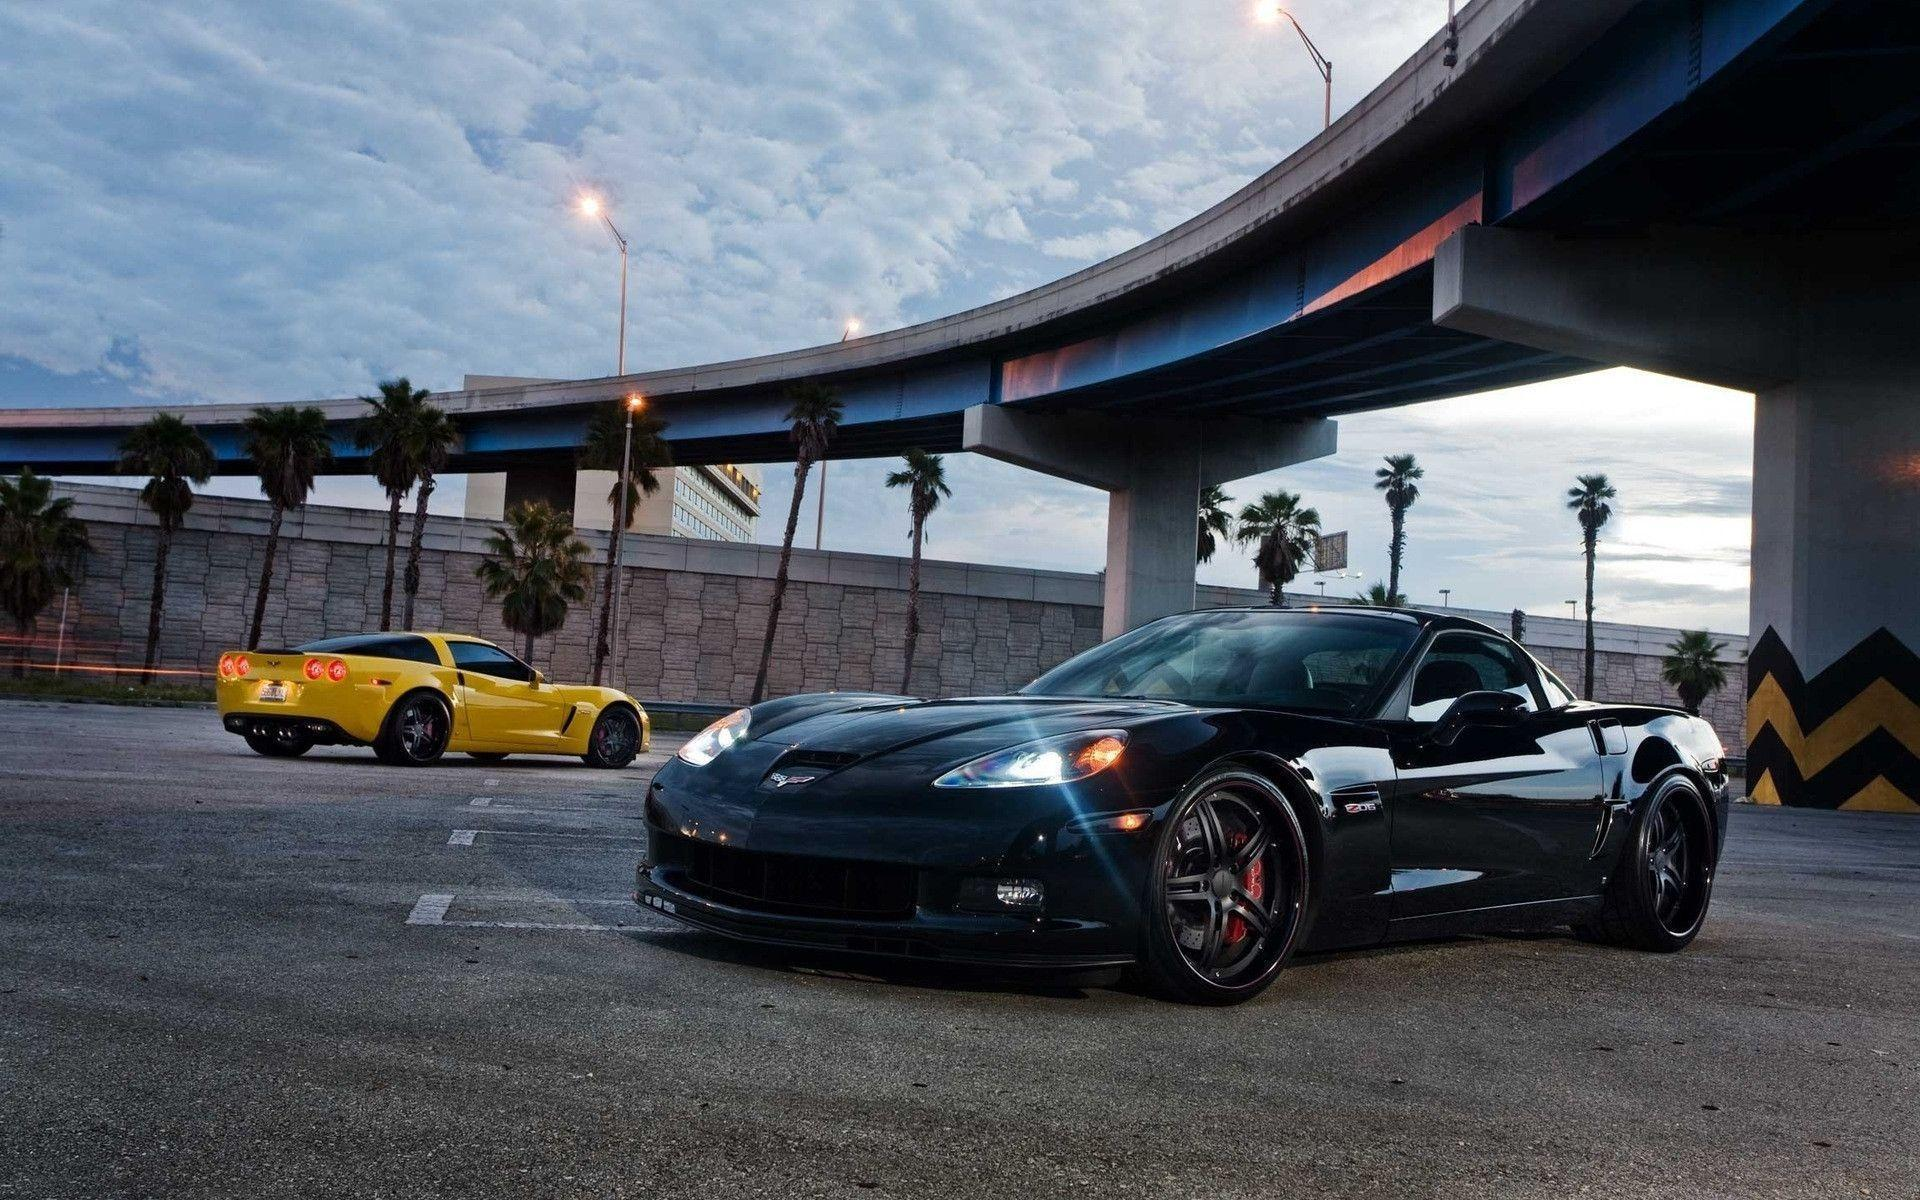 black yellow chevrolet corvette c5 z06 wallpaper paravucom hd - Corvette C5 Logo Wallpaper